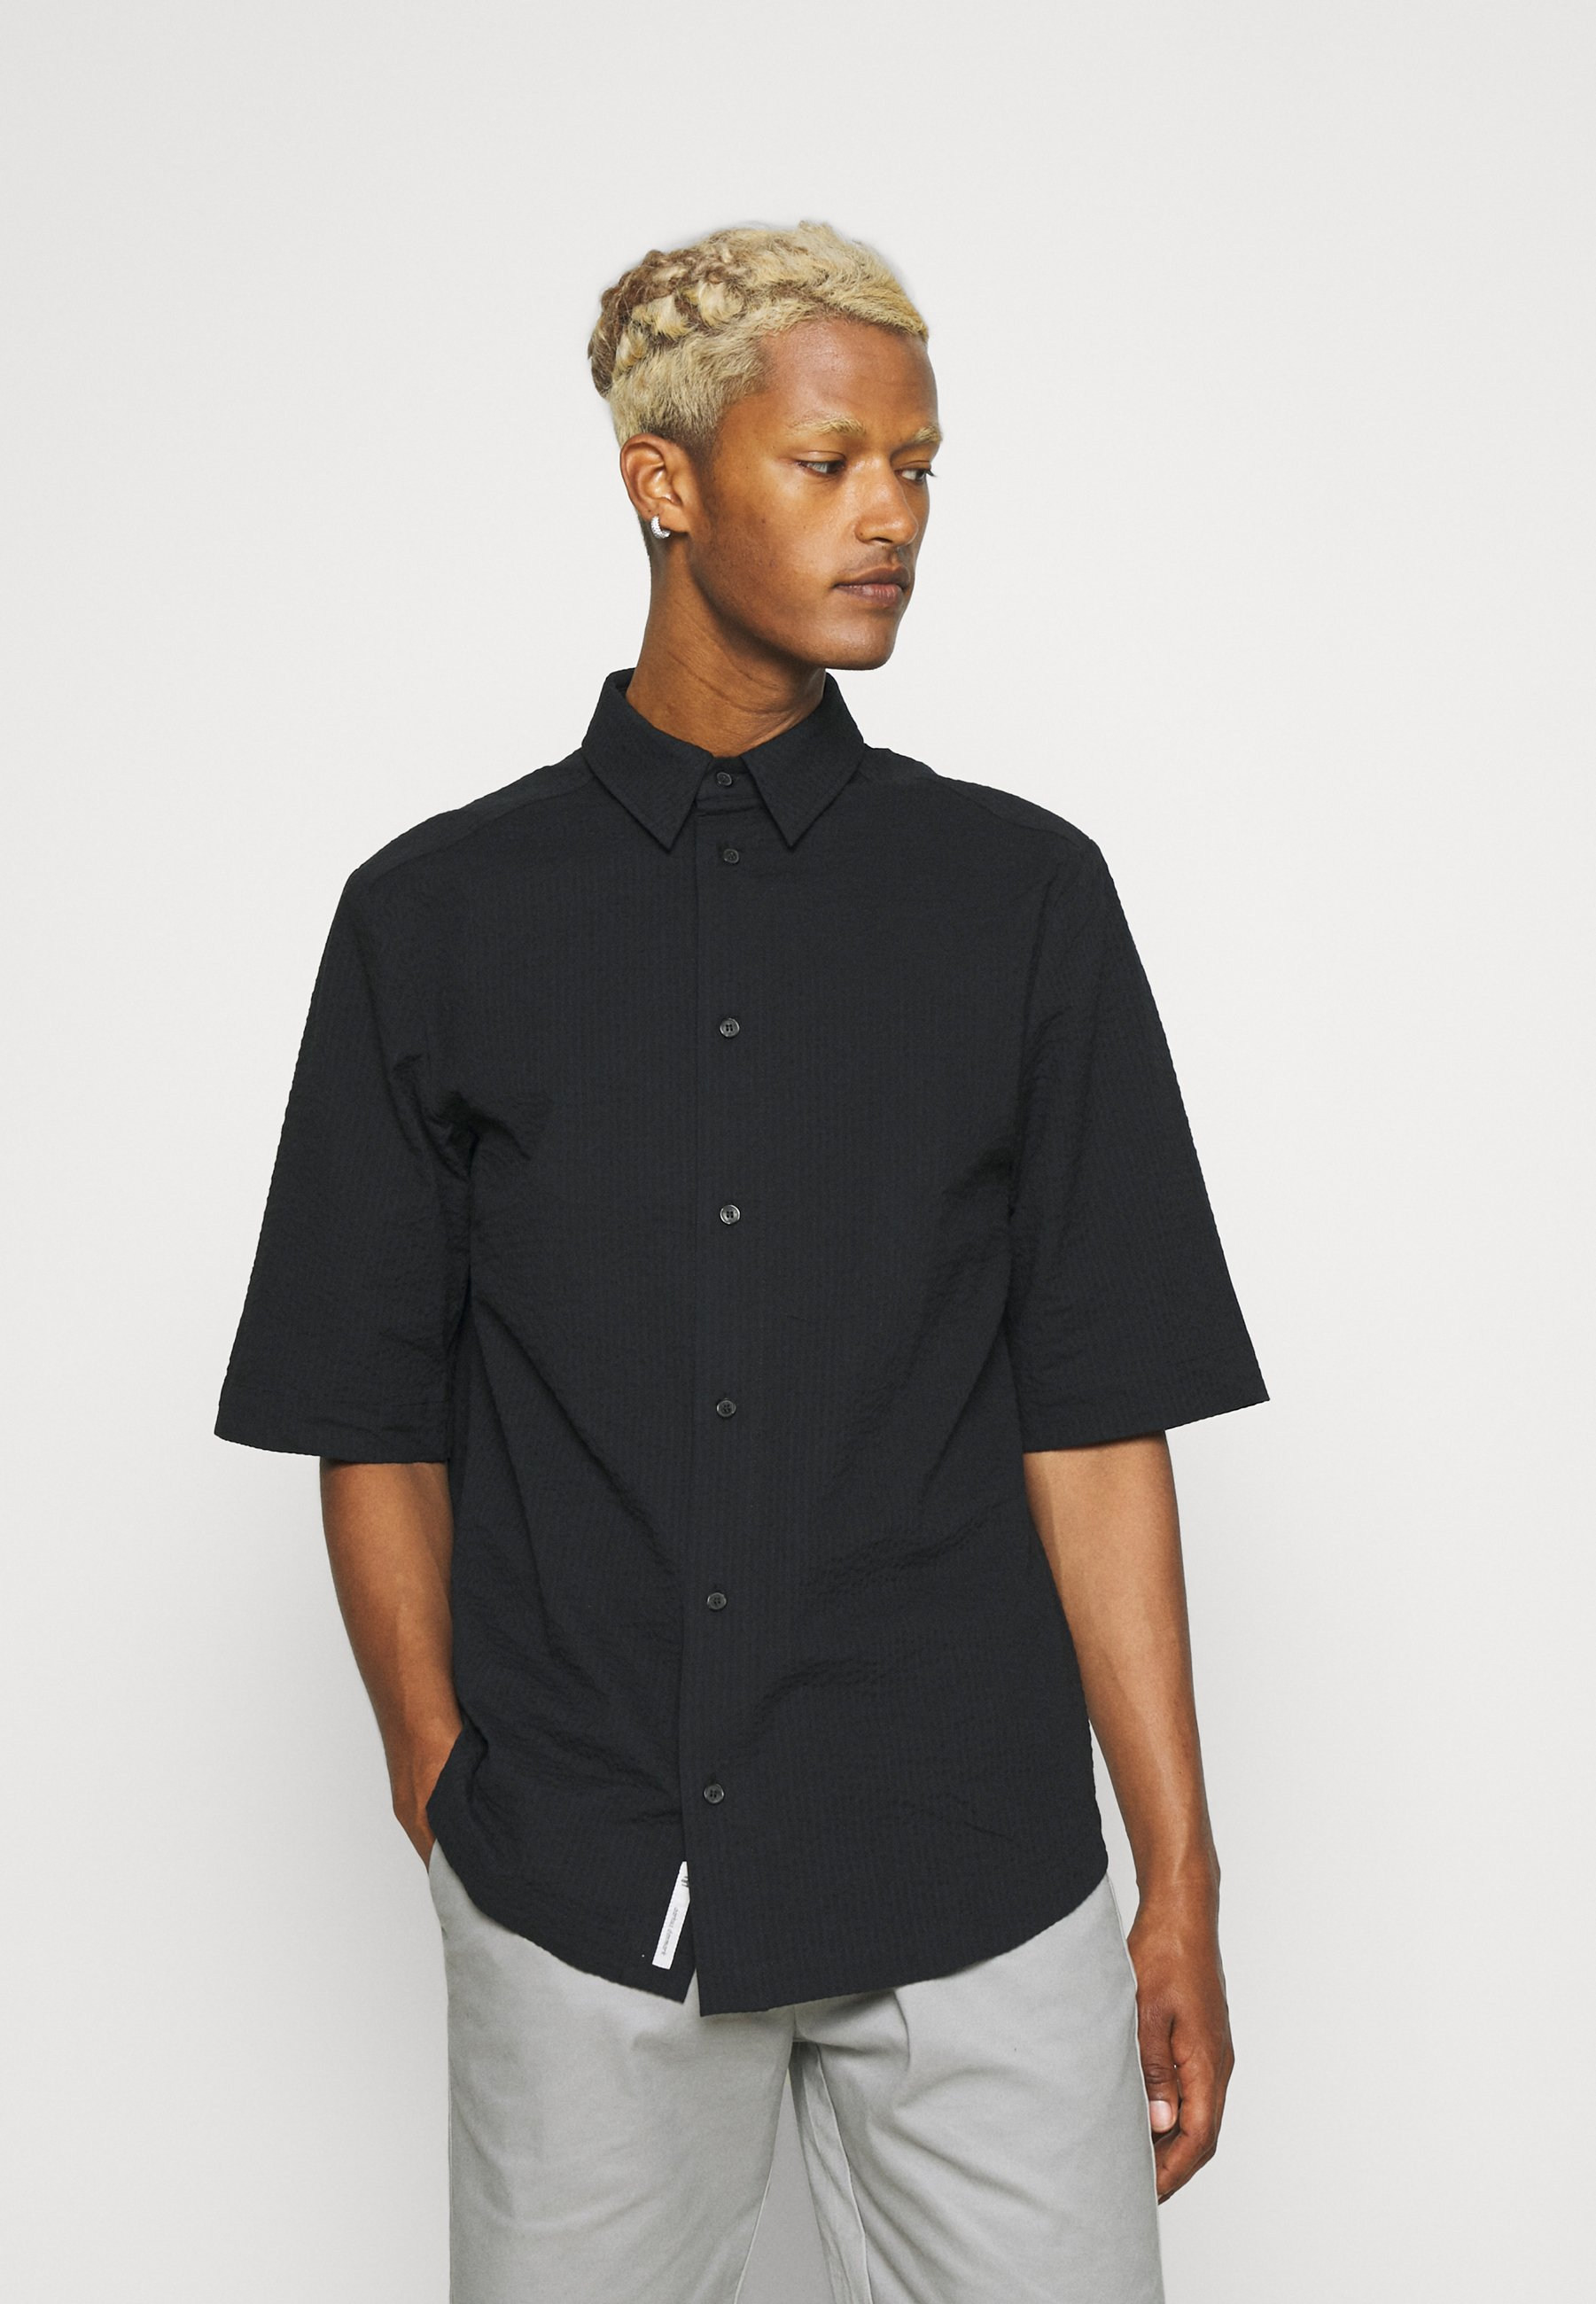 Uomo HASTINGS - Camicia